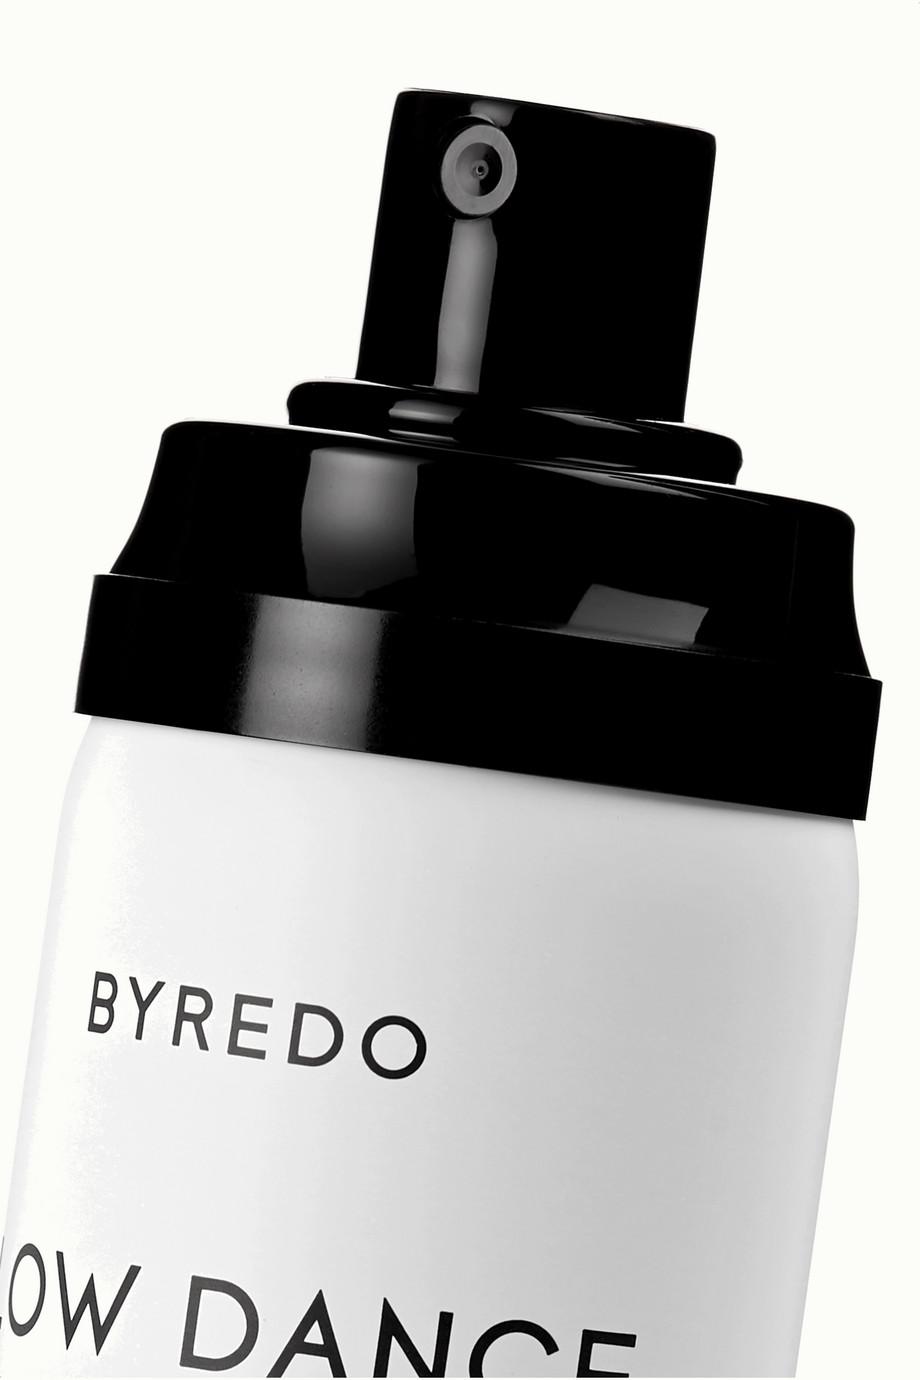 Byredo Slow Dance Hair Perfume - Opoponax, Geranium & Vanilla, 75ml